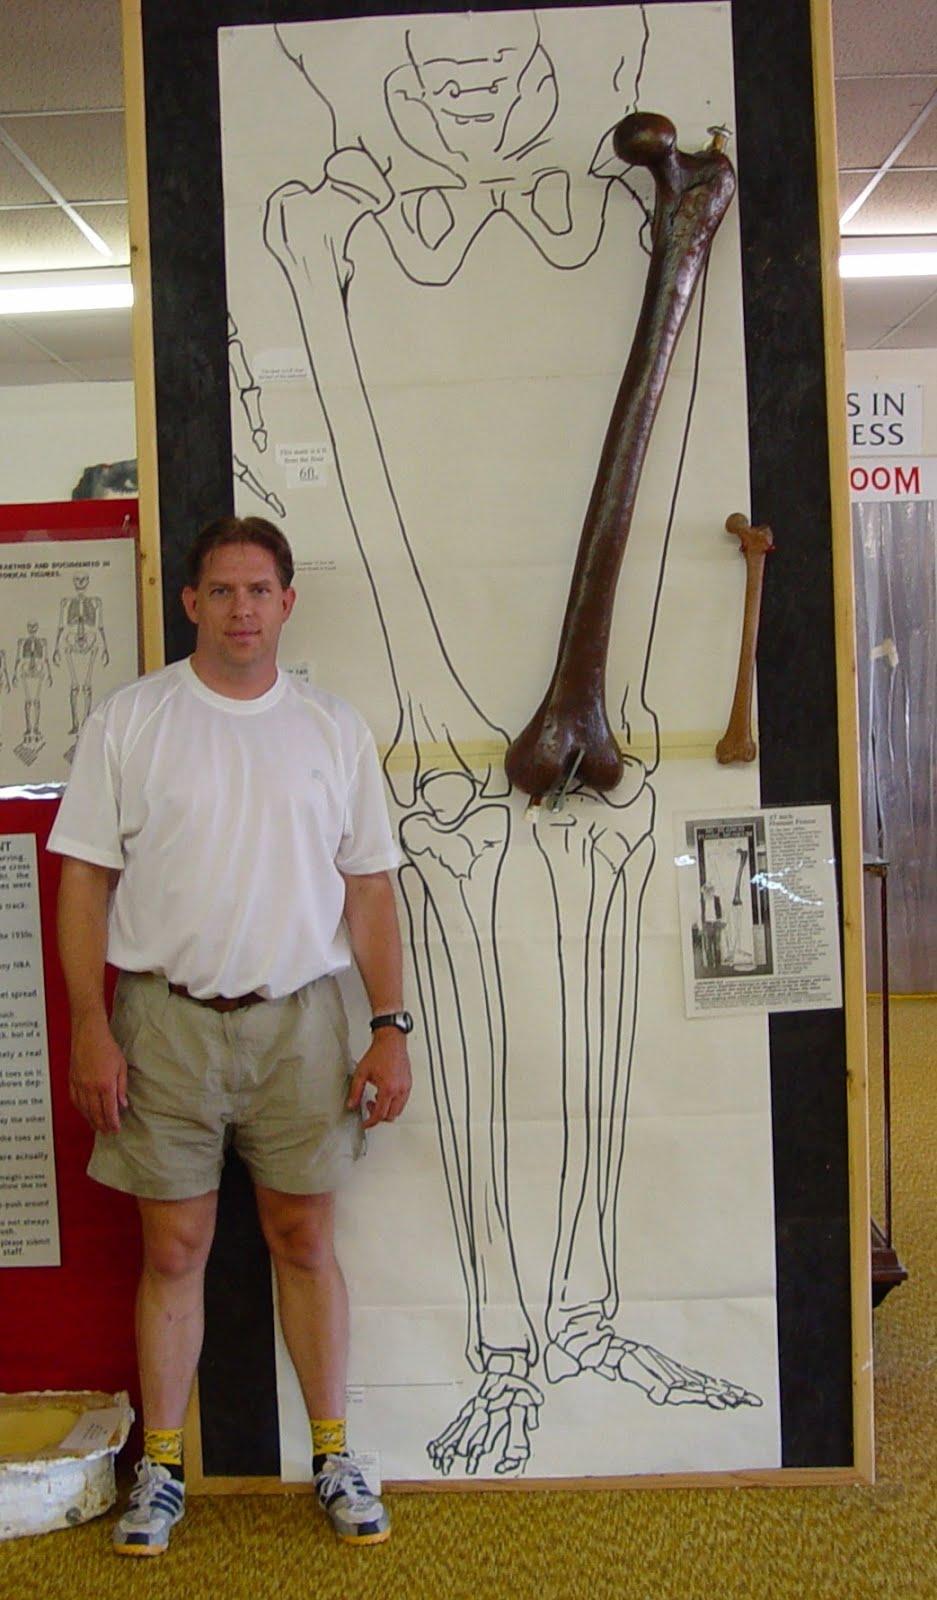 Spiritual investigators part 3 evidence for giants